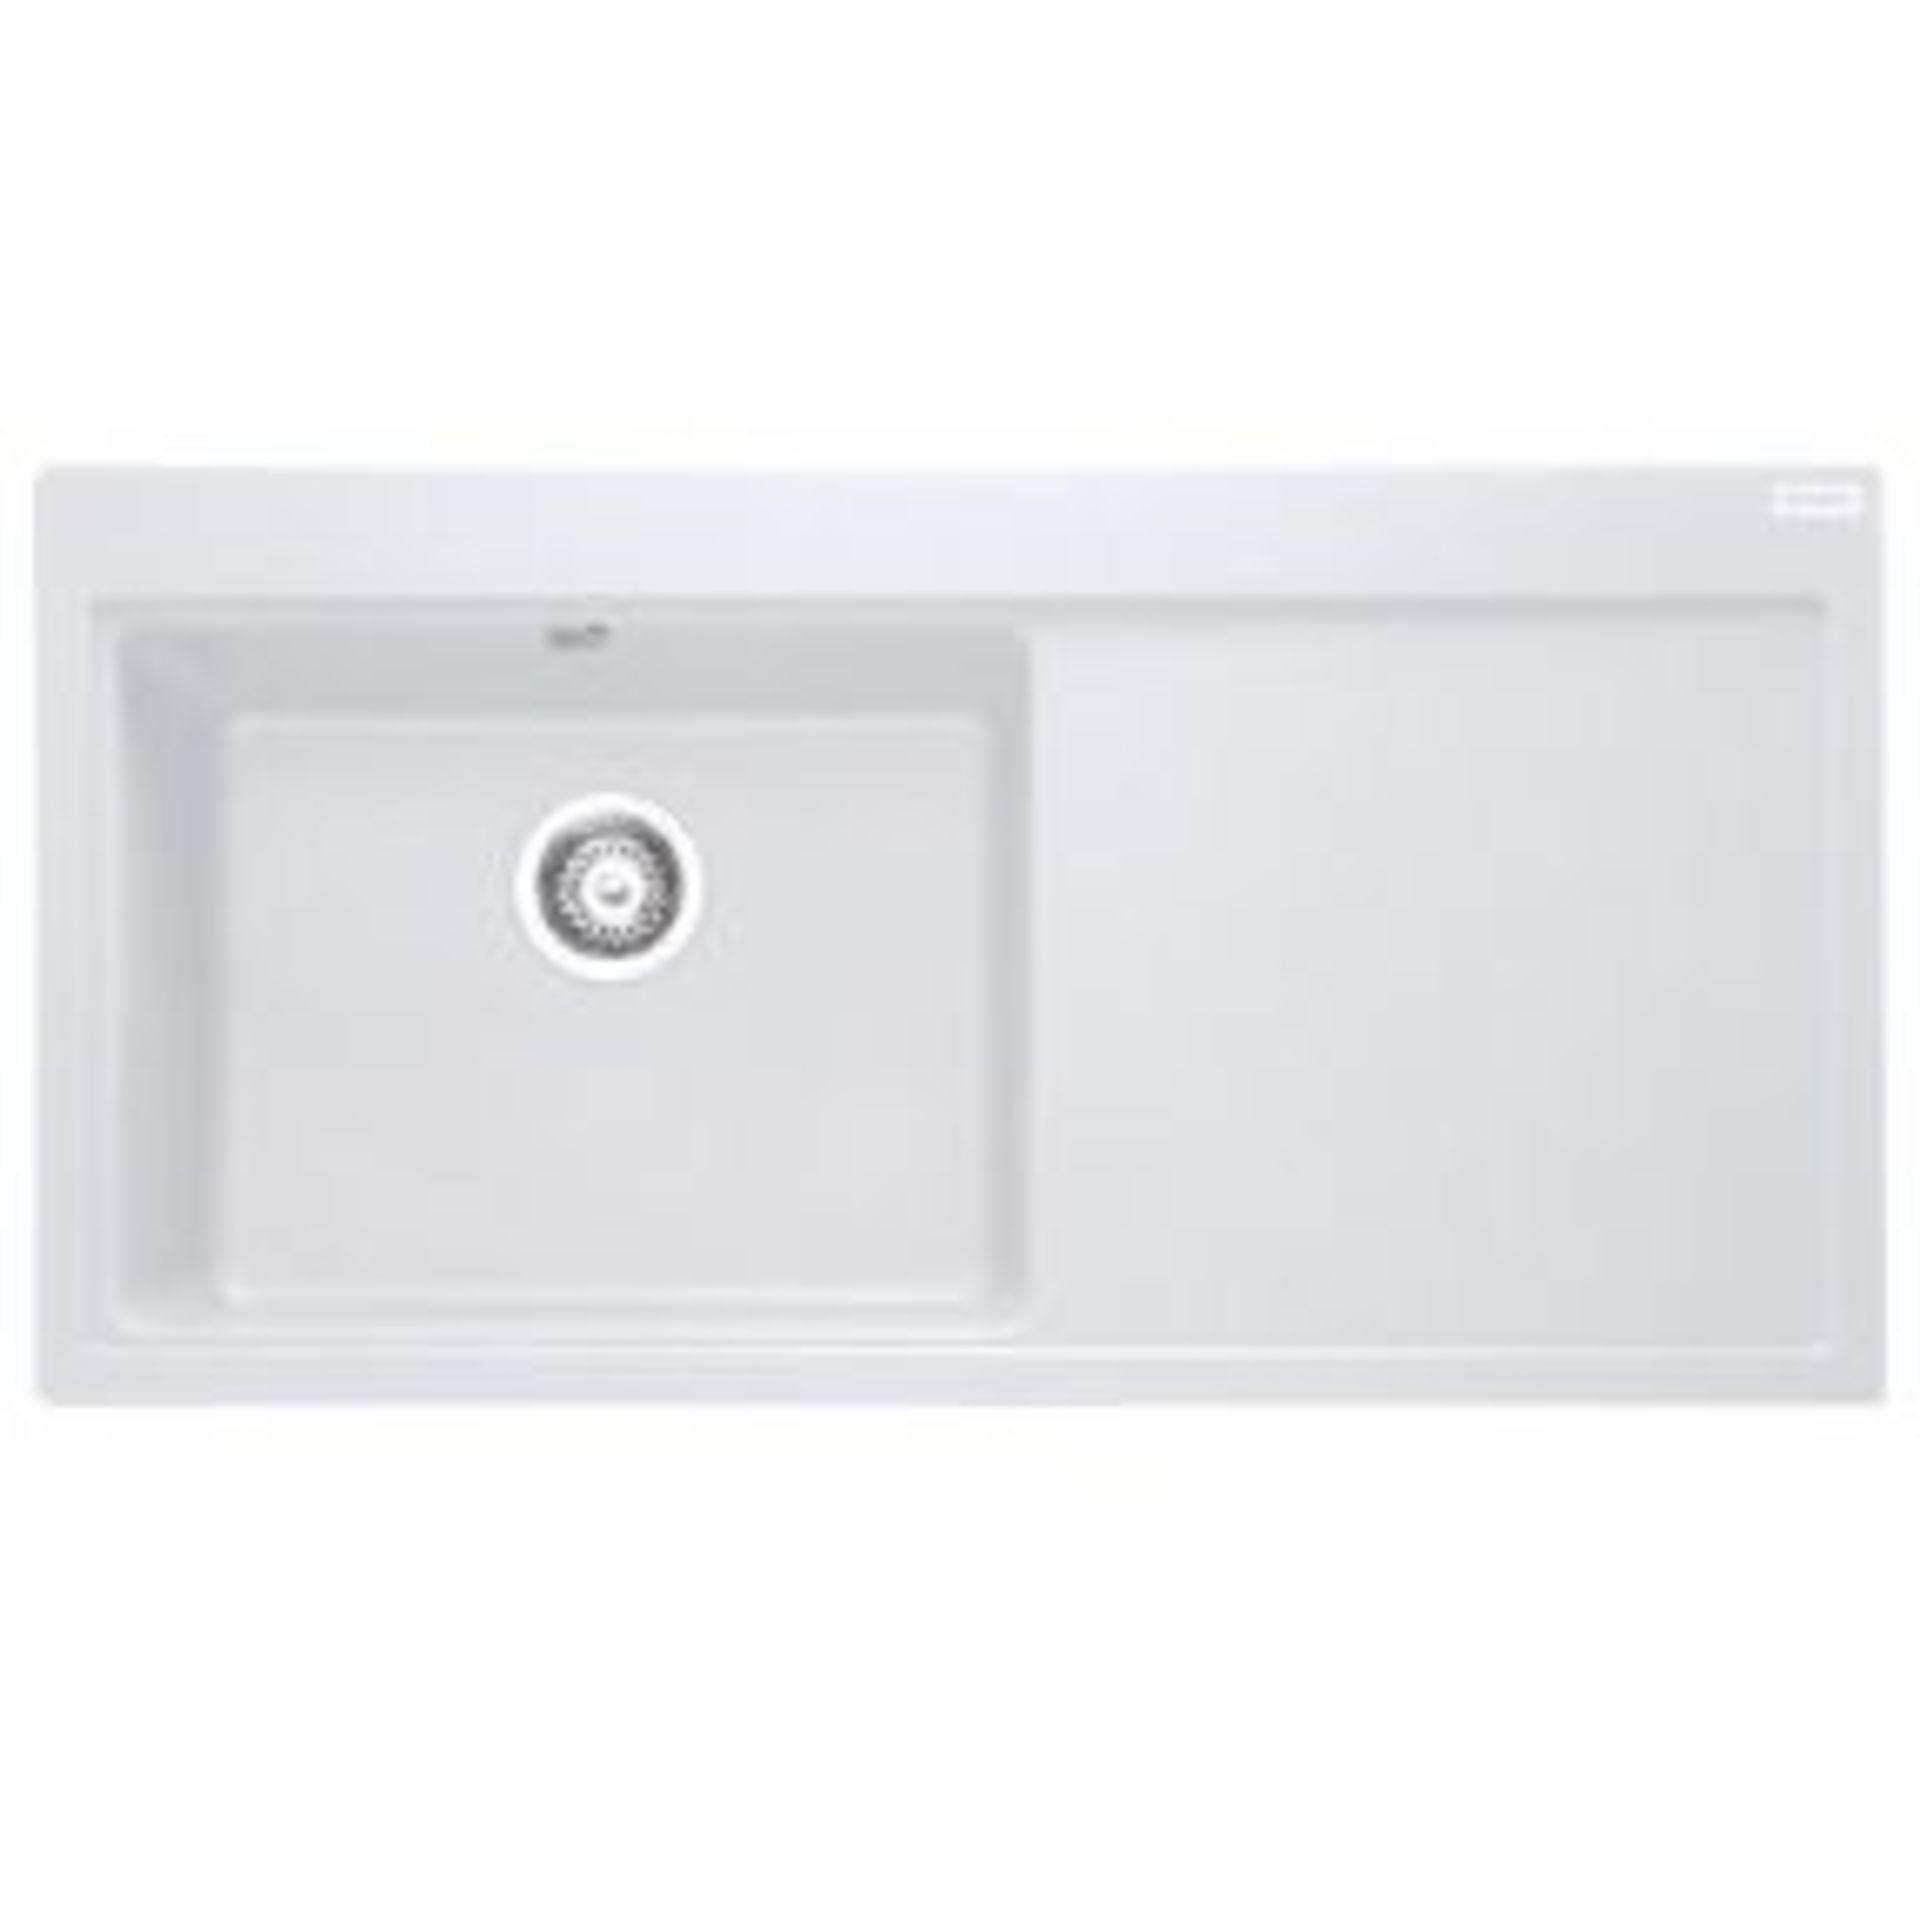 NEW (REF2) 2 x Franke Mythos MTG 611DP Fragnite Kitchen Sink RHD 114.0046.305. RRP £436.44. Colour